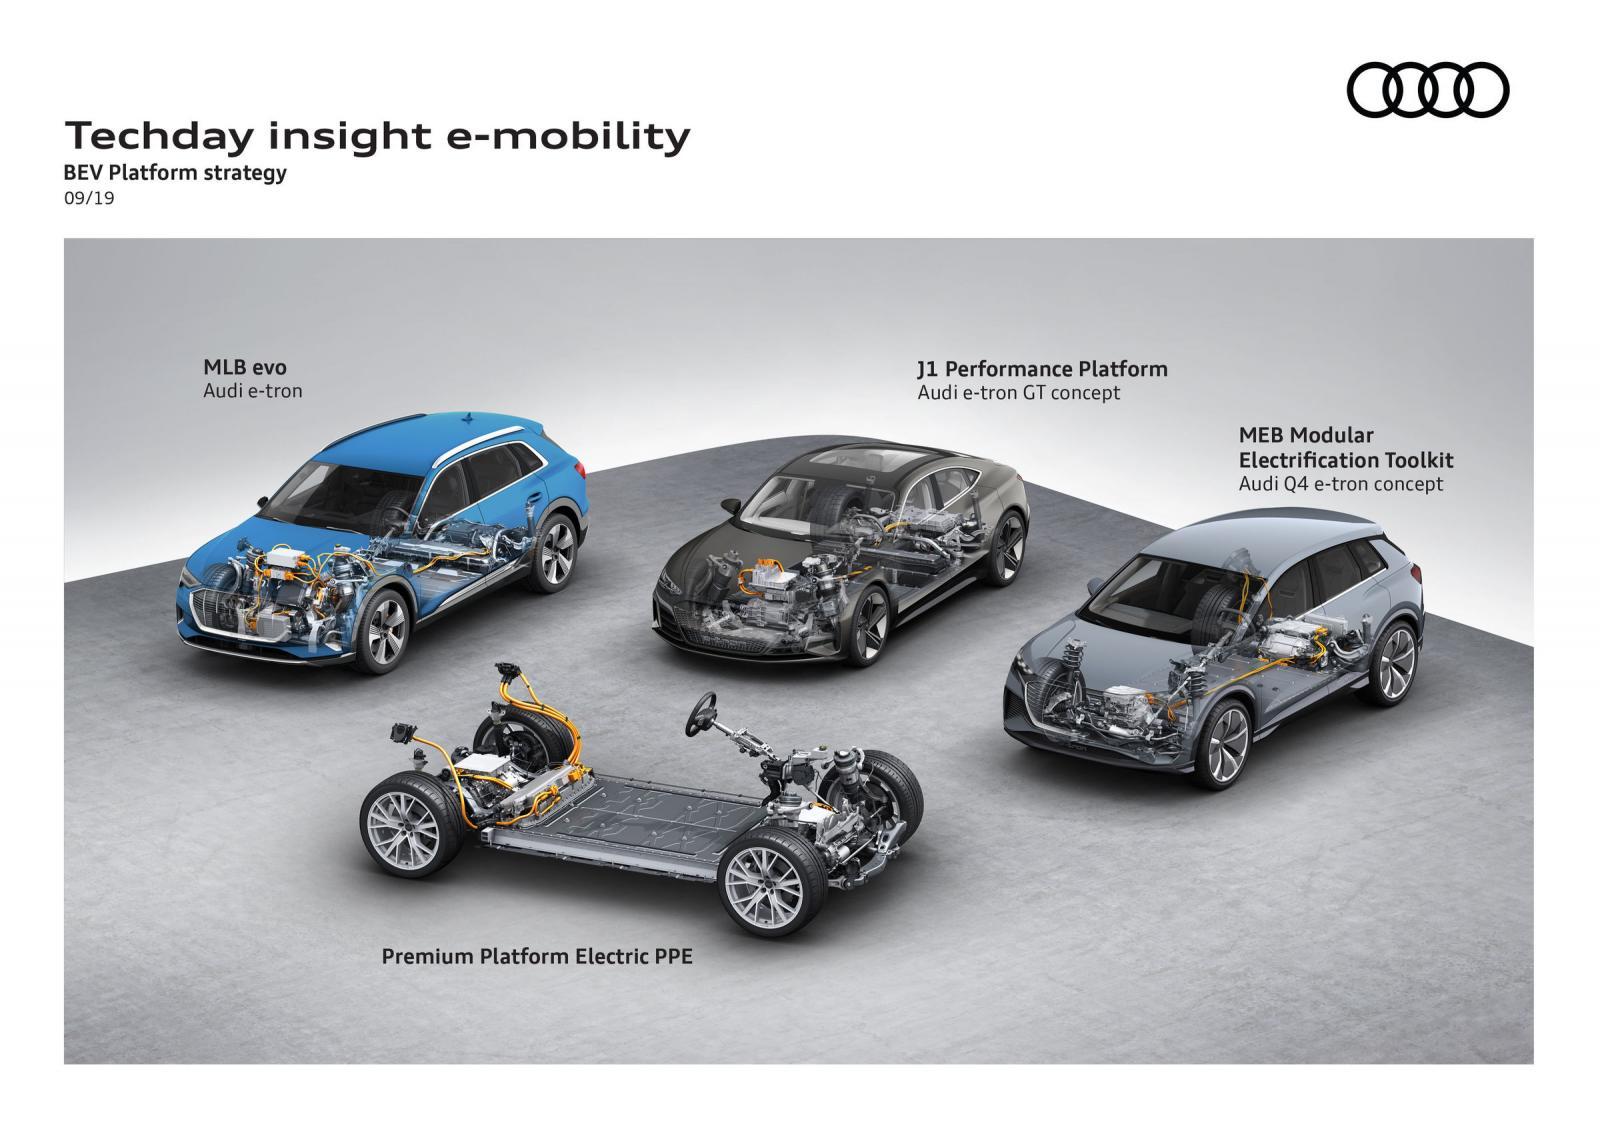 Audi plataformas